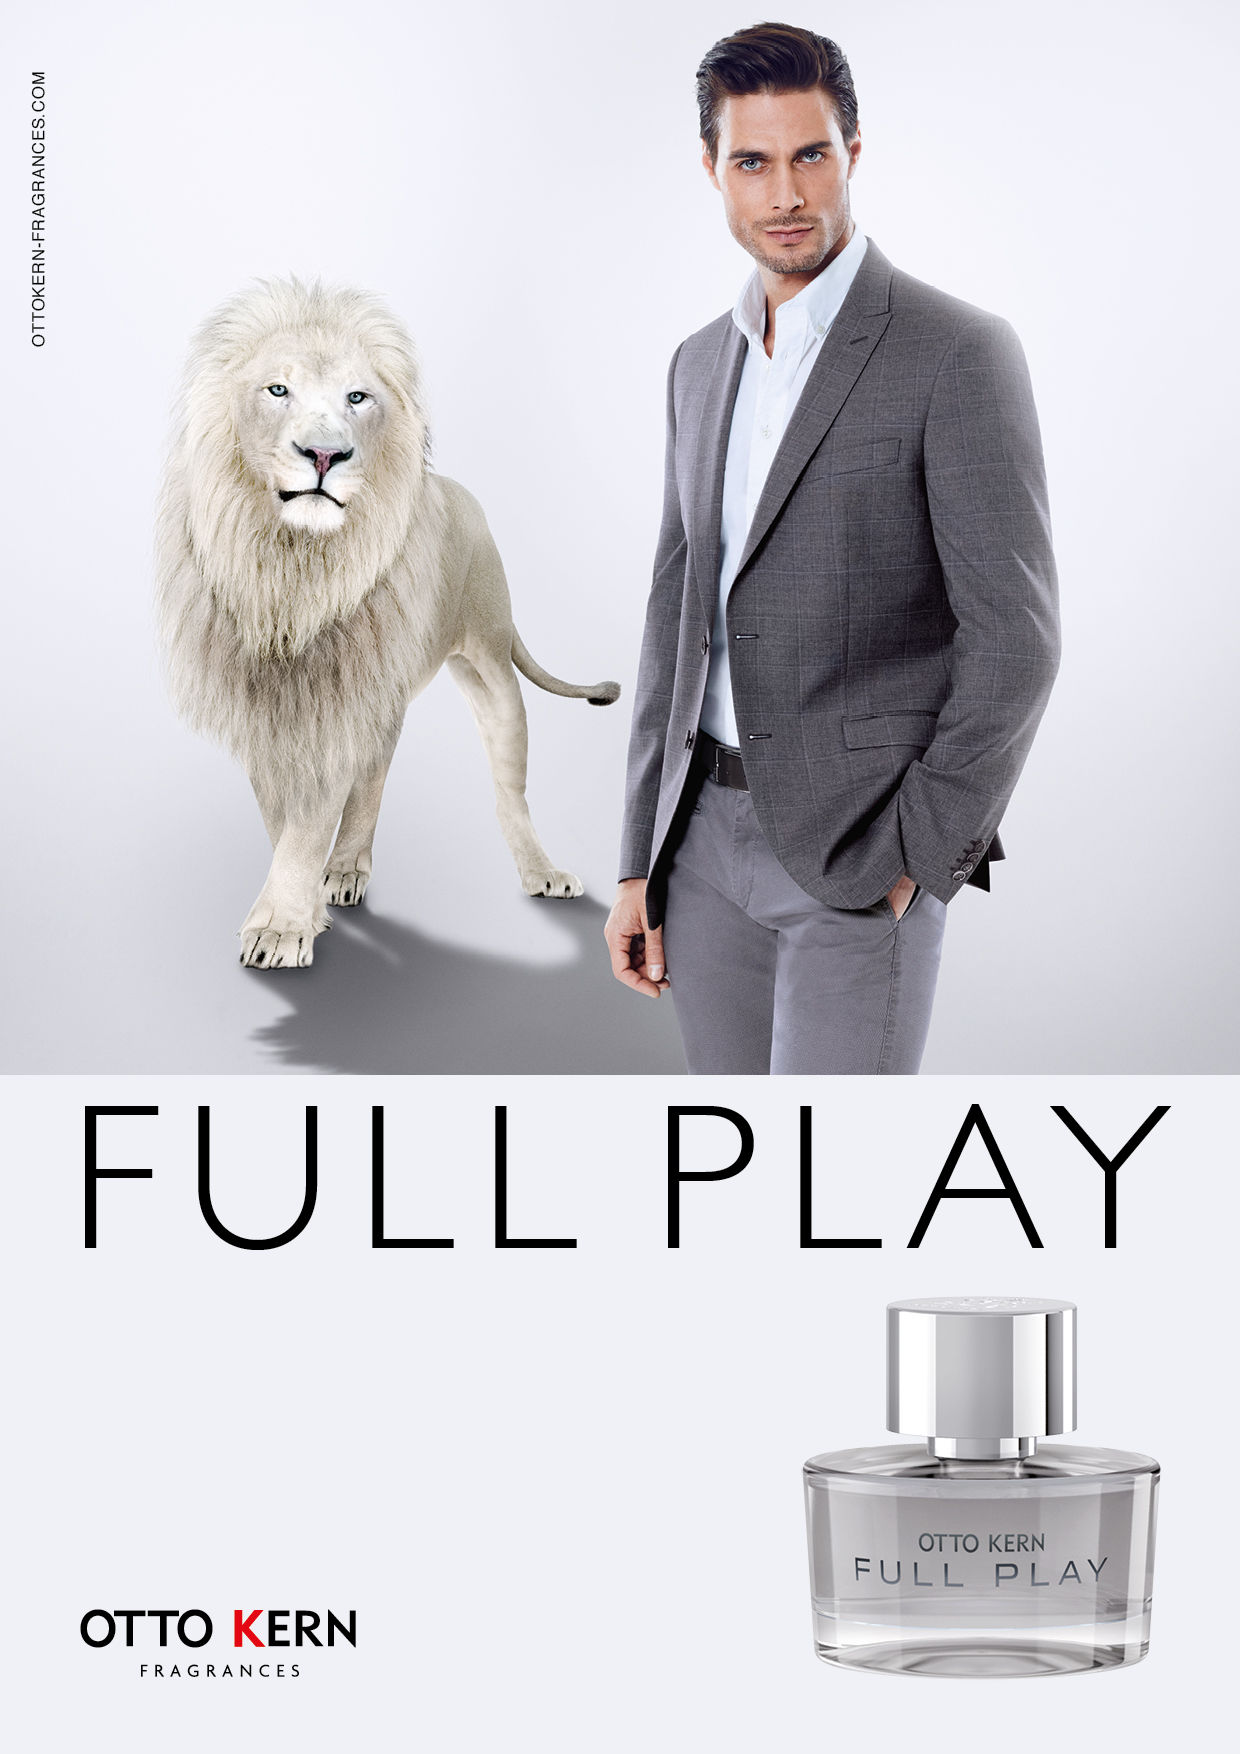 OFENSTEIN WERBEAGENTUR for Otto Kern's Fragrance 'Playful' & 'Full Play'